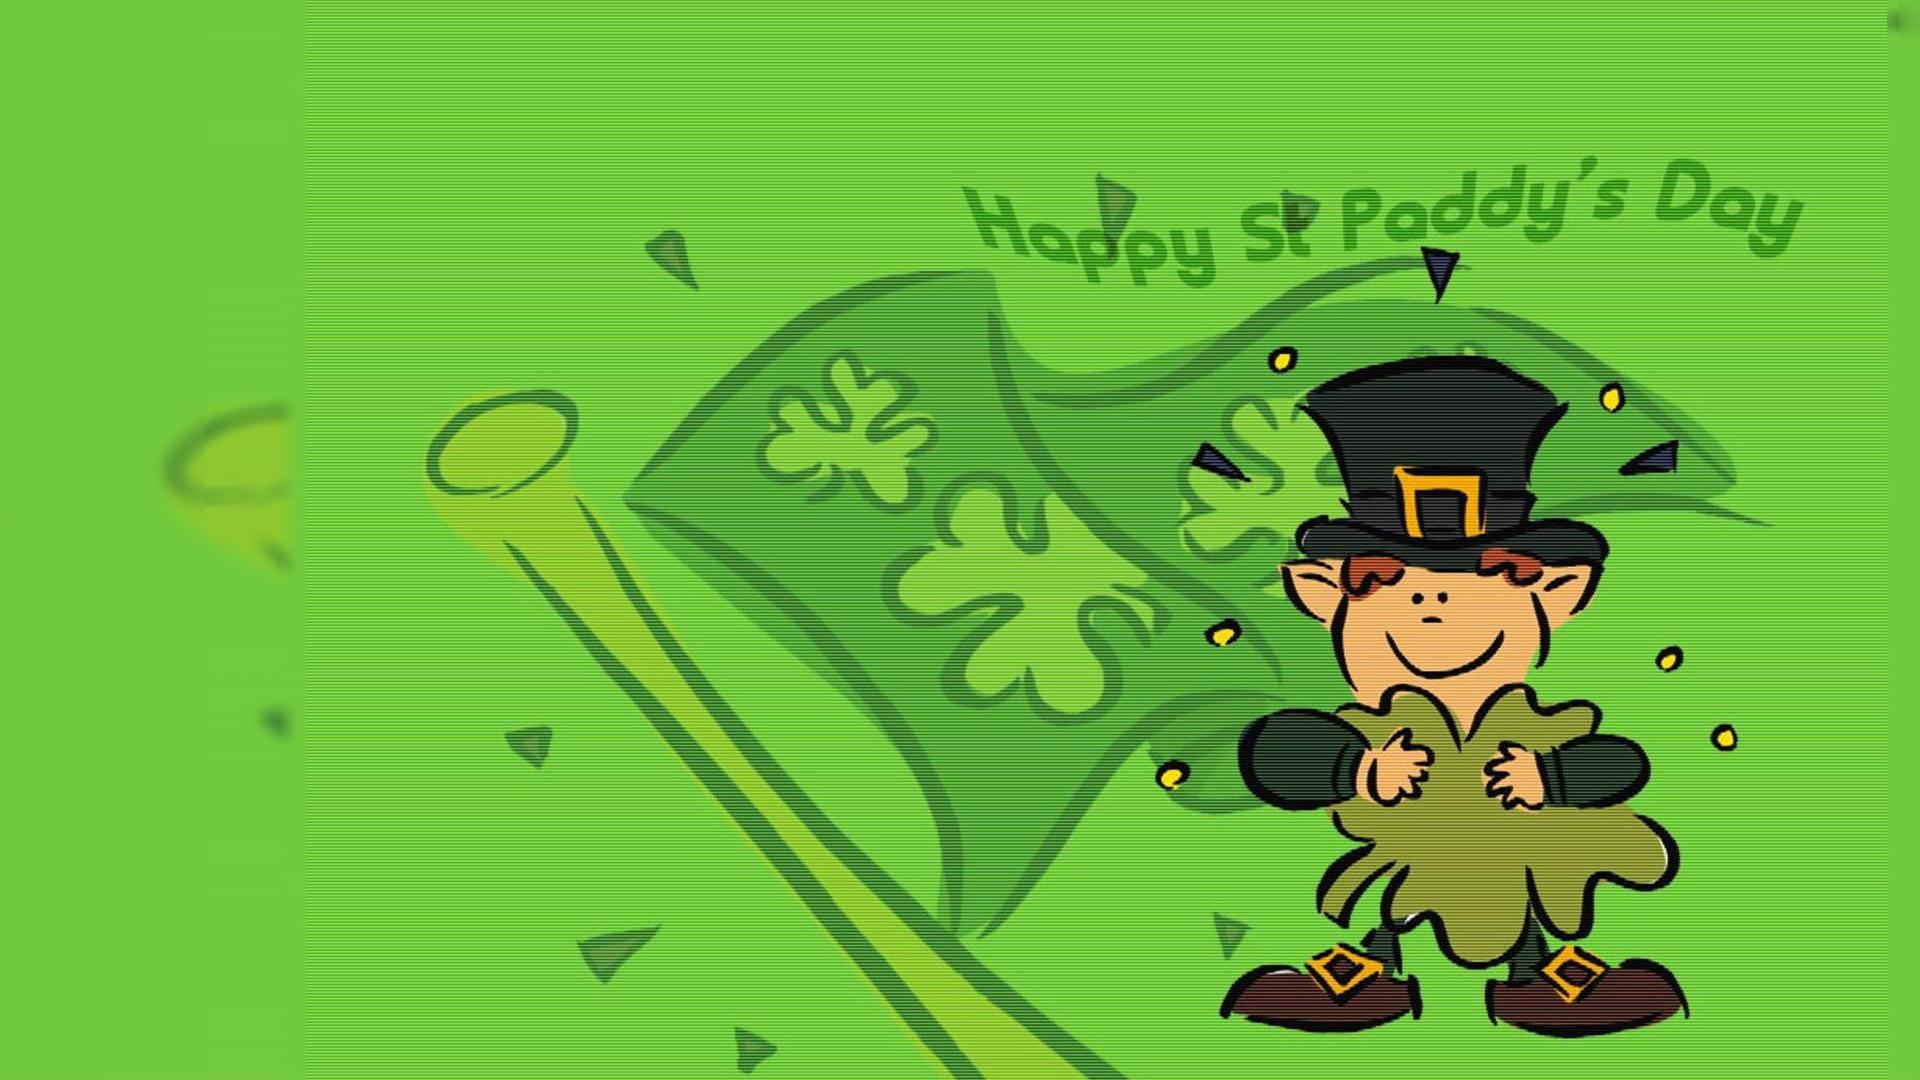 Saint Patrick's Day Widescreen